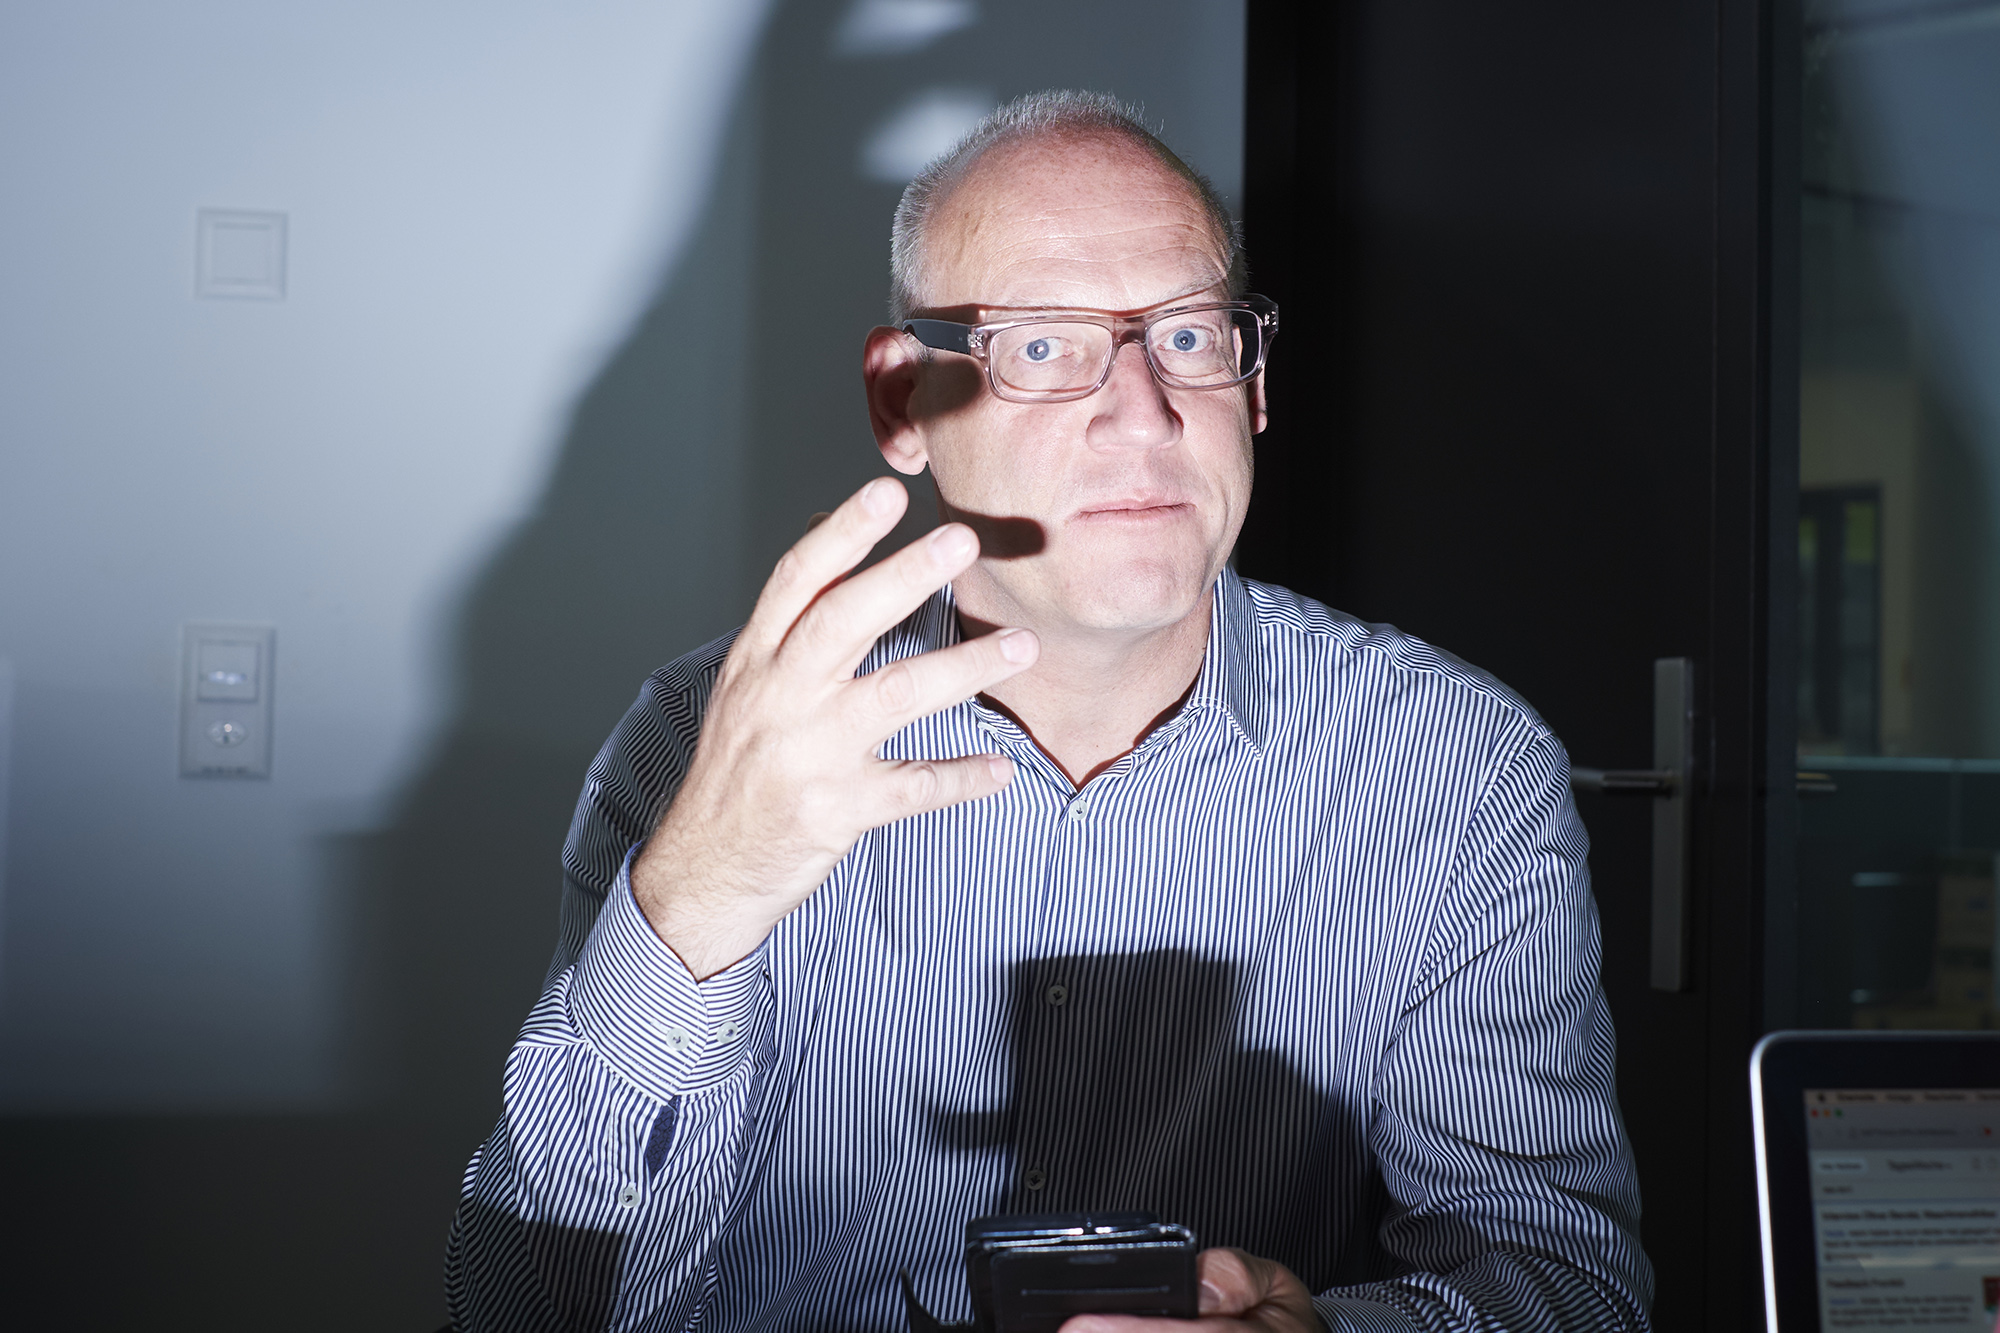 Oliver Bendel, Maschinenethiker